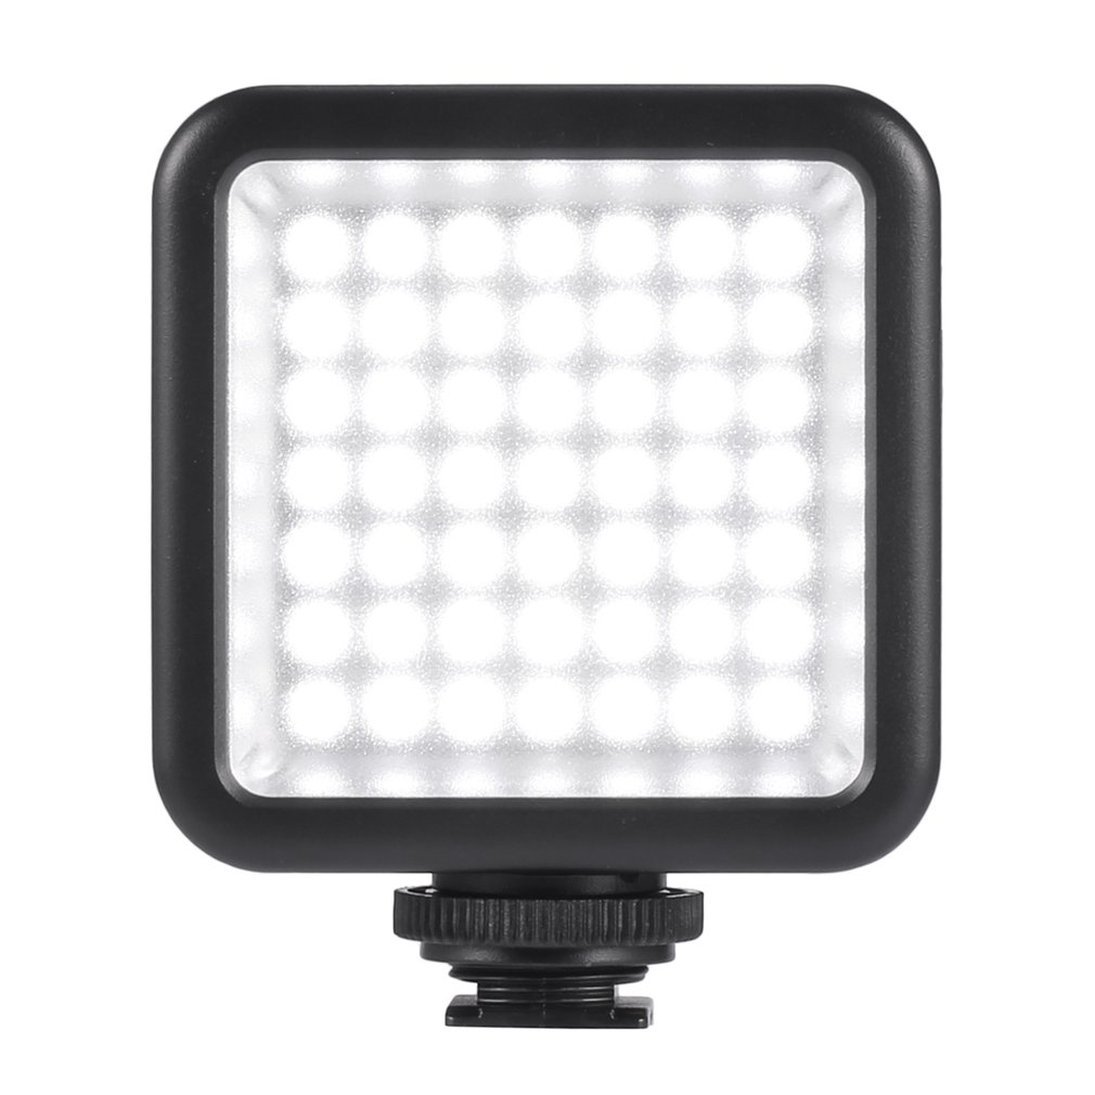 49 L/ámparas de luz LED Video Iluminaci/ón fotogr/áfica para fotograf/ía de c/ámara